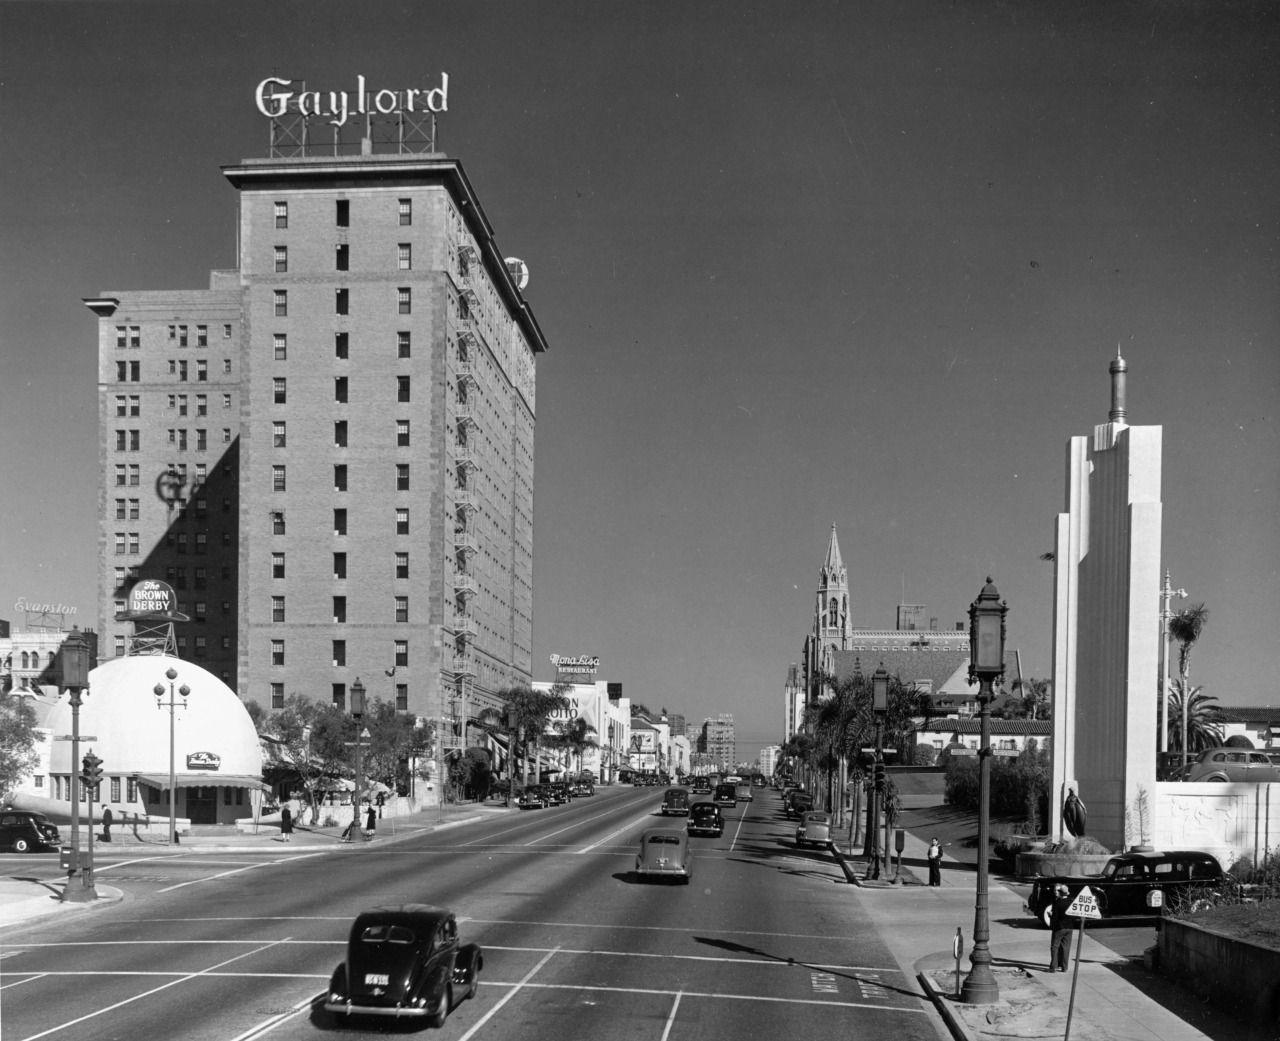 Ambassador Hotel Wilshire Boulevard Los Angeles